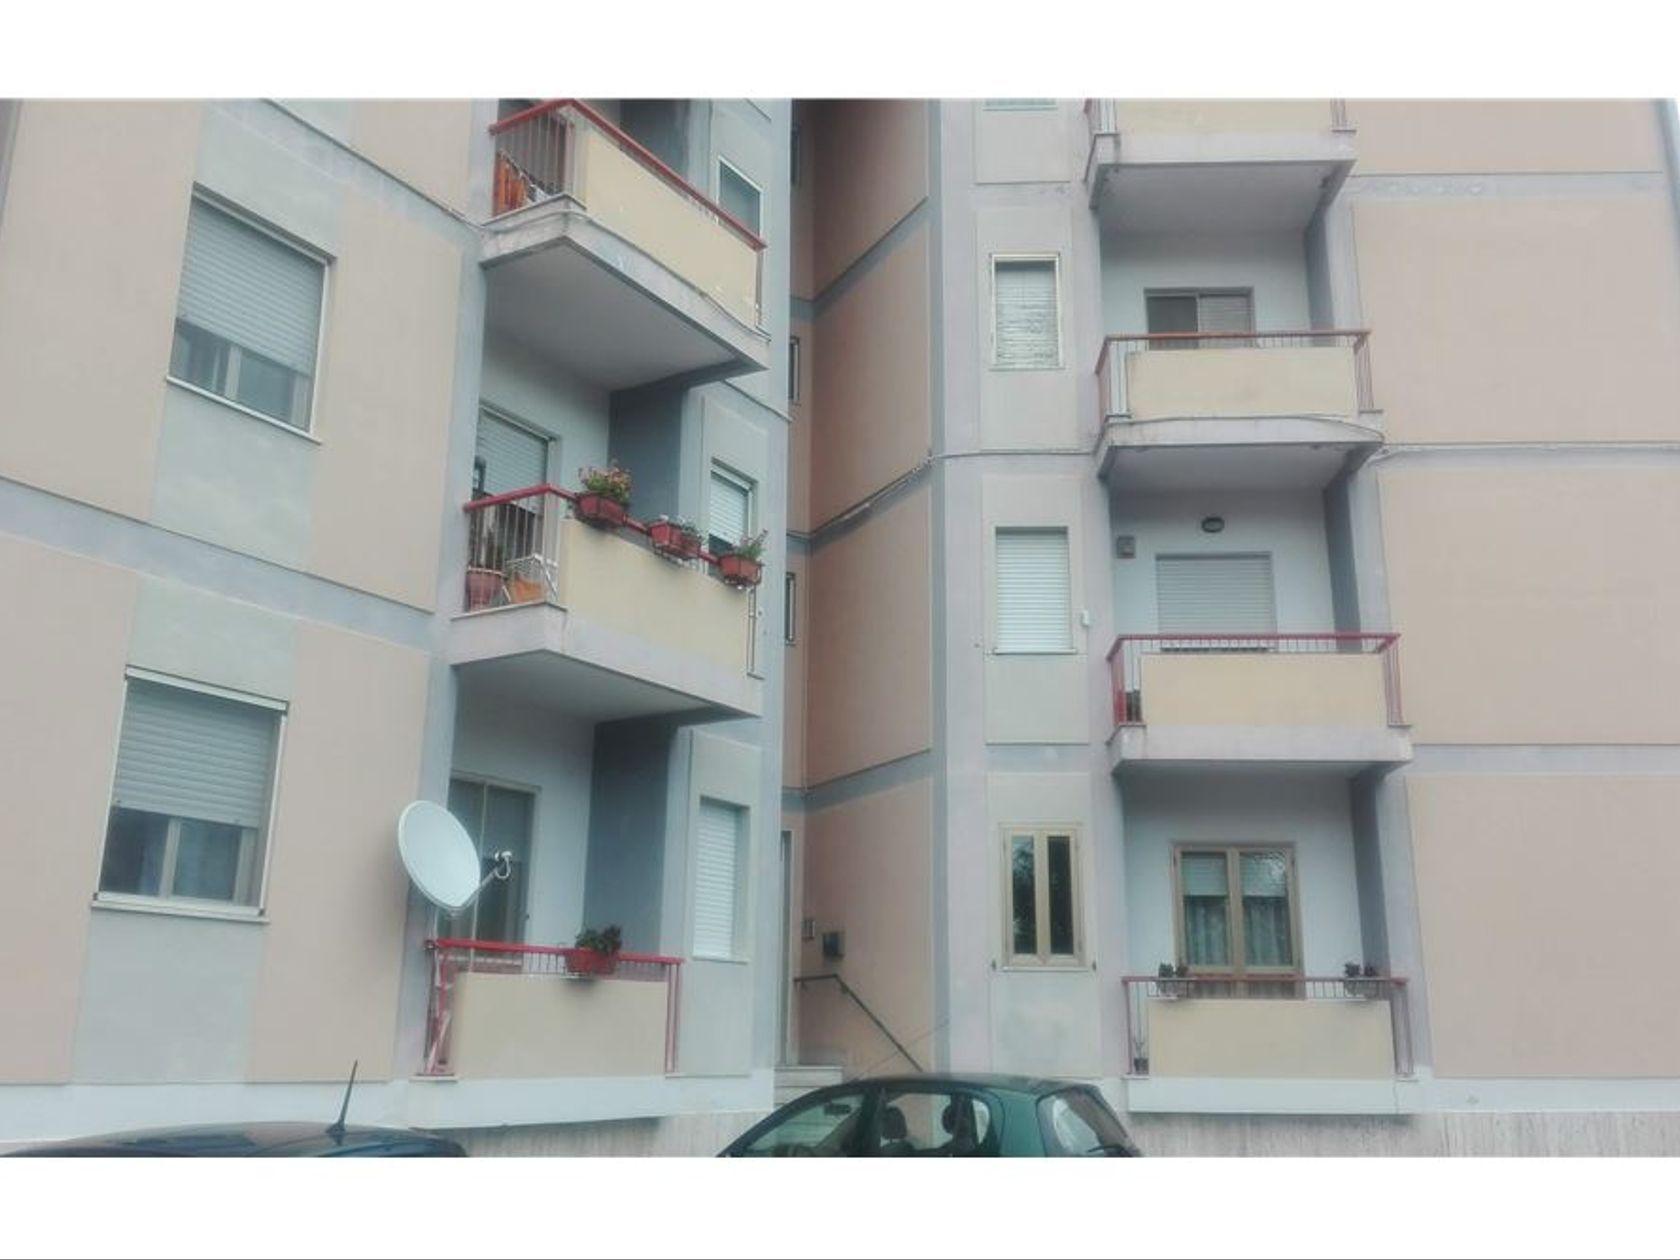 Appartamento Santa Maria, Catanzaro, CZ Vendita